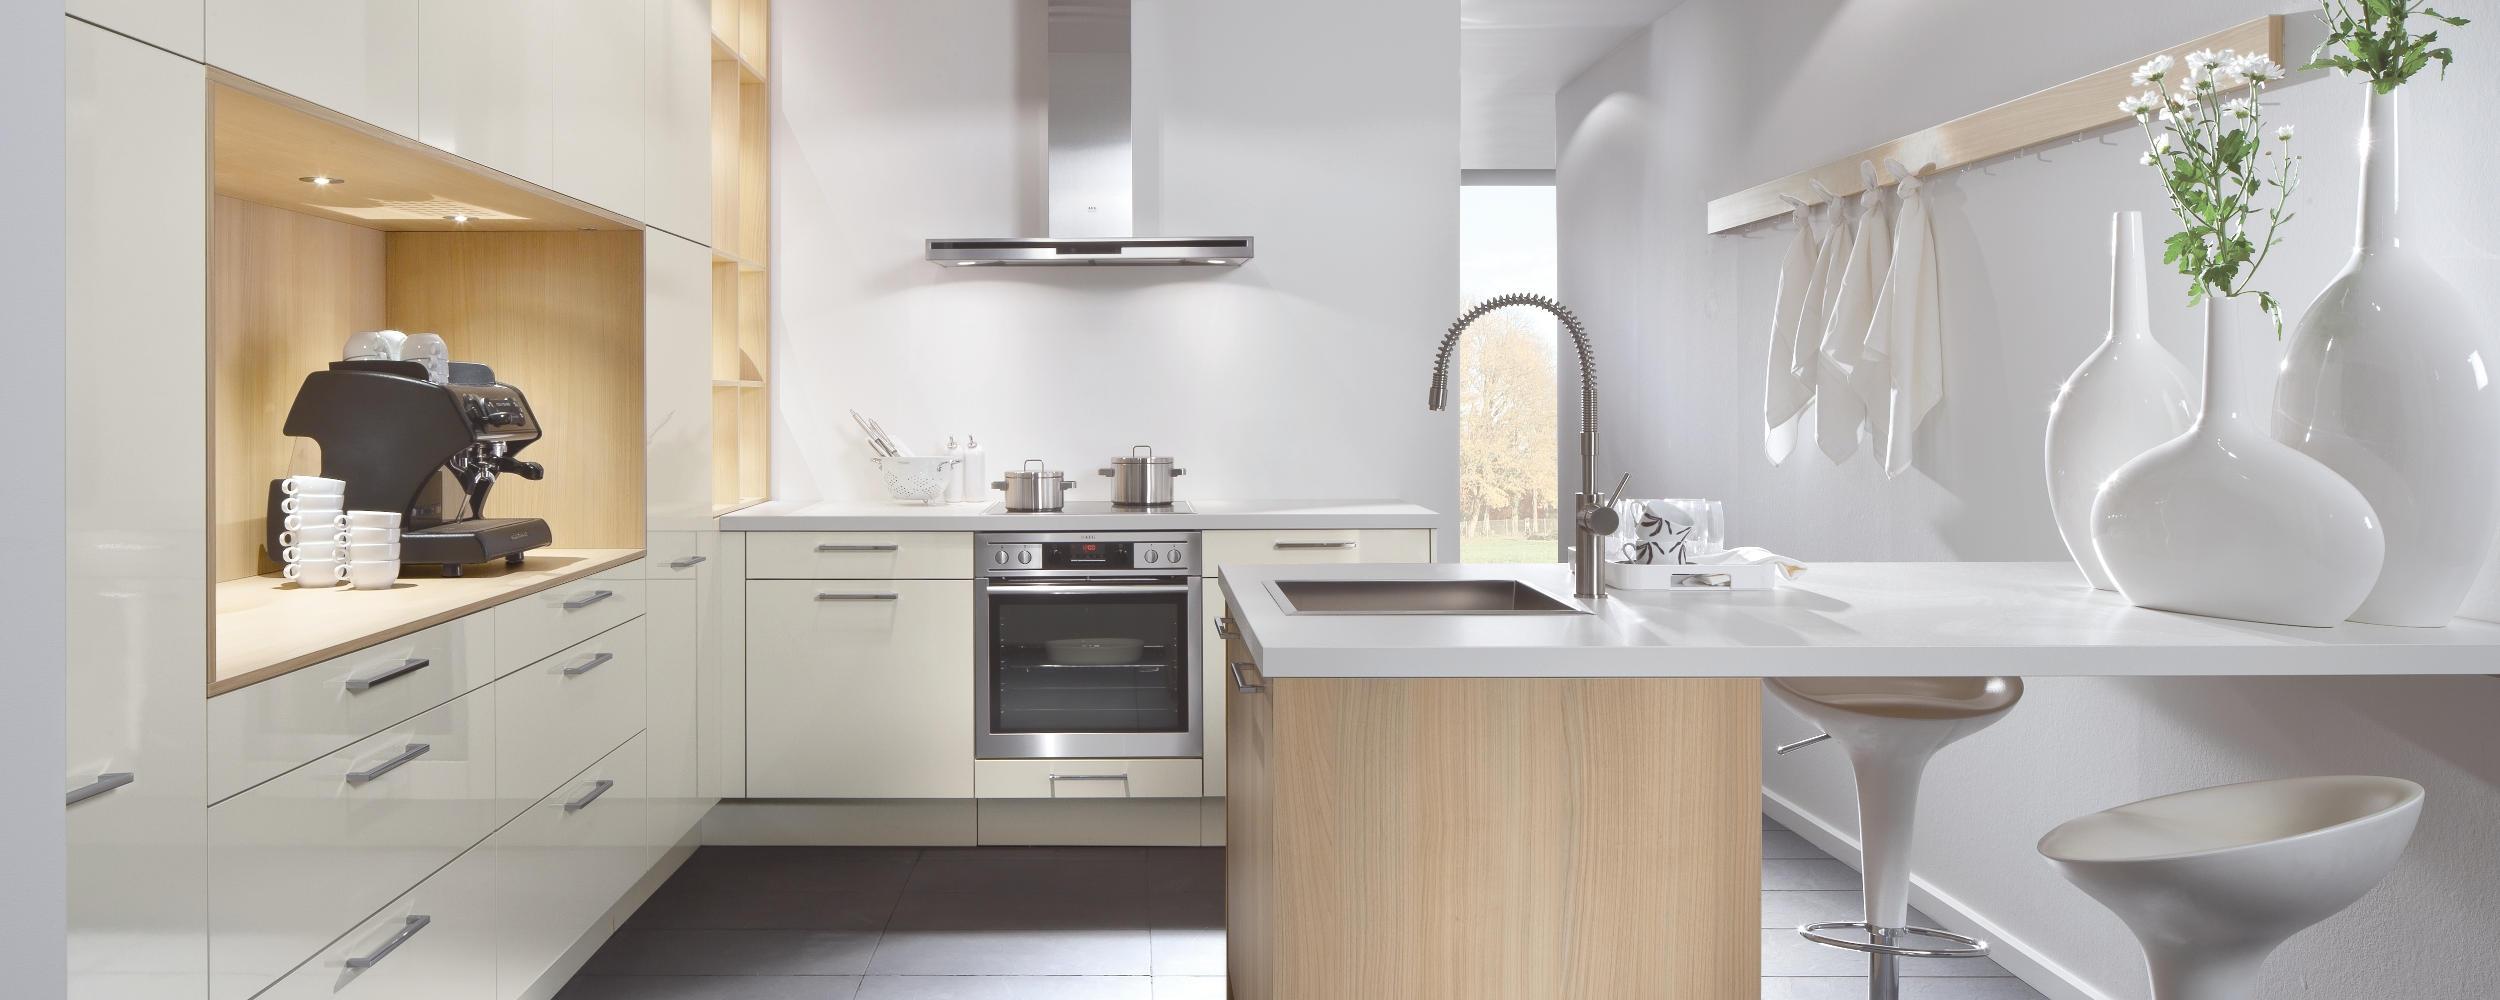 pronorm classic line kitchen scotland